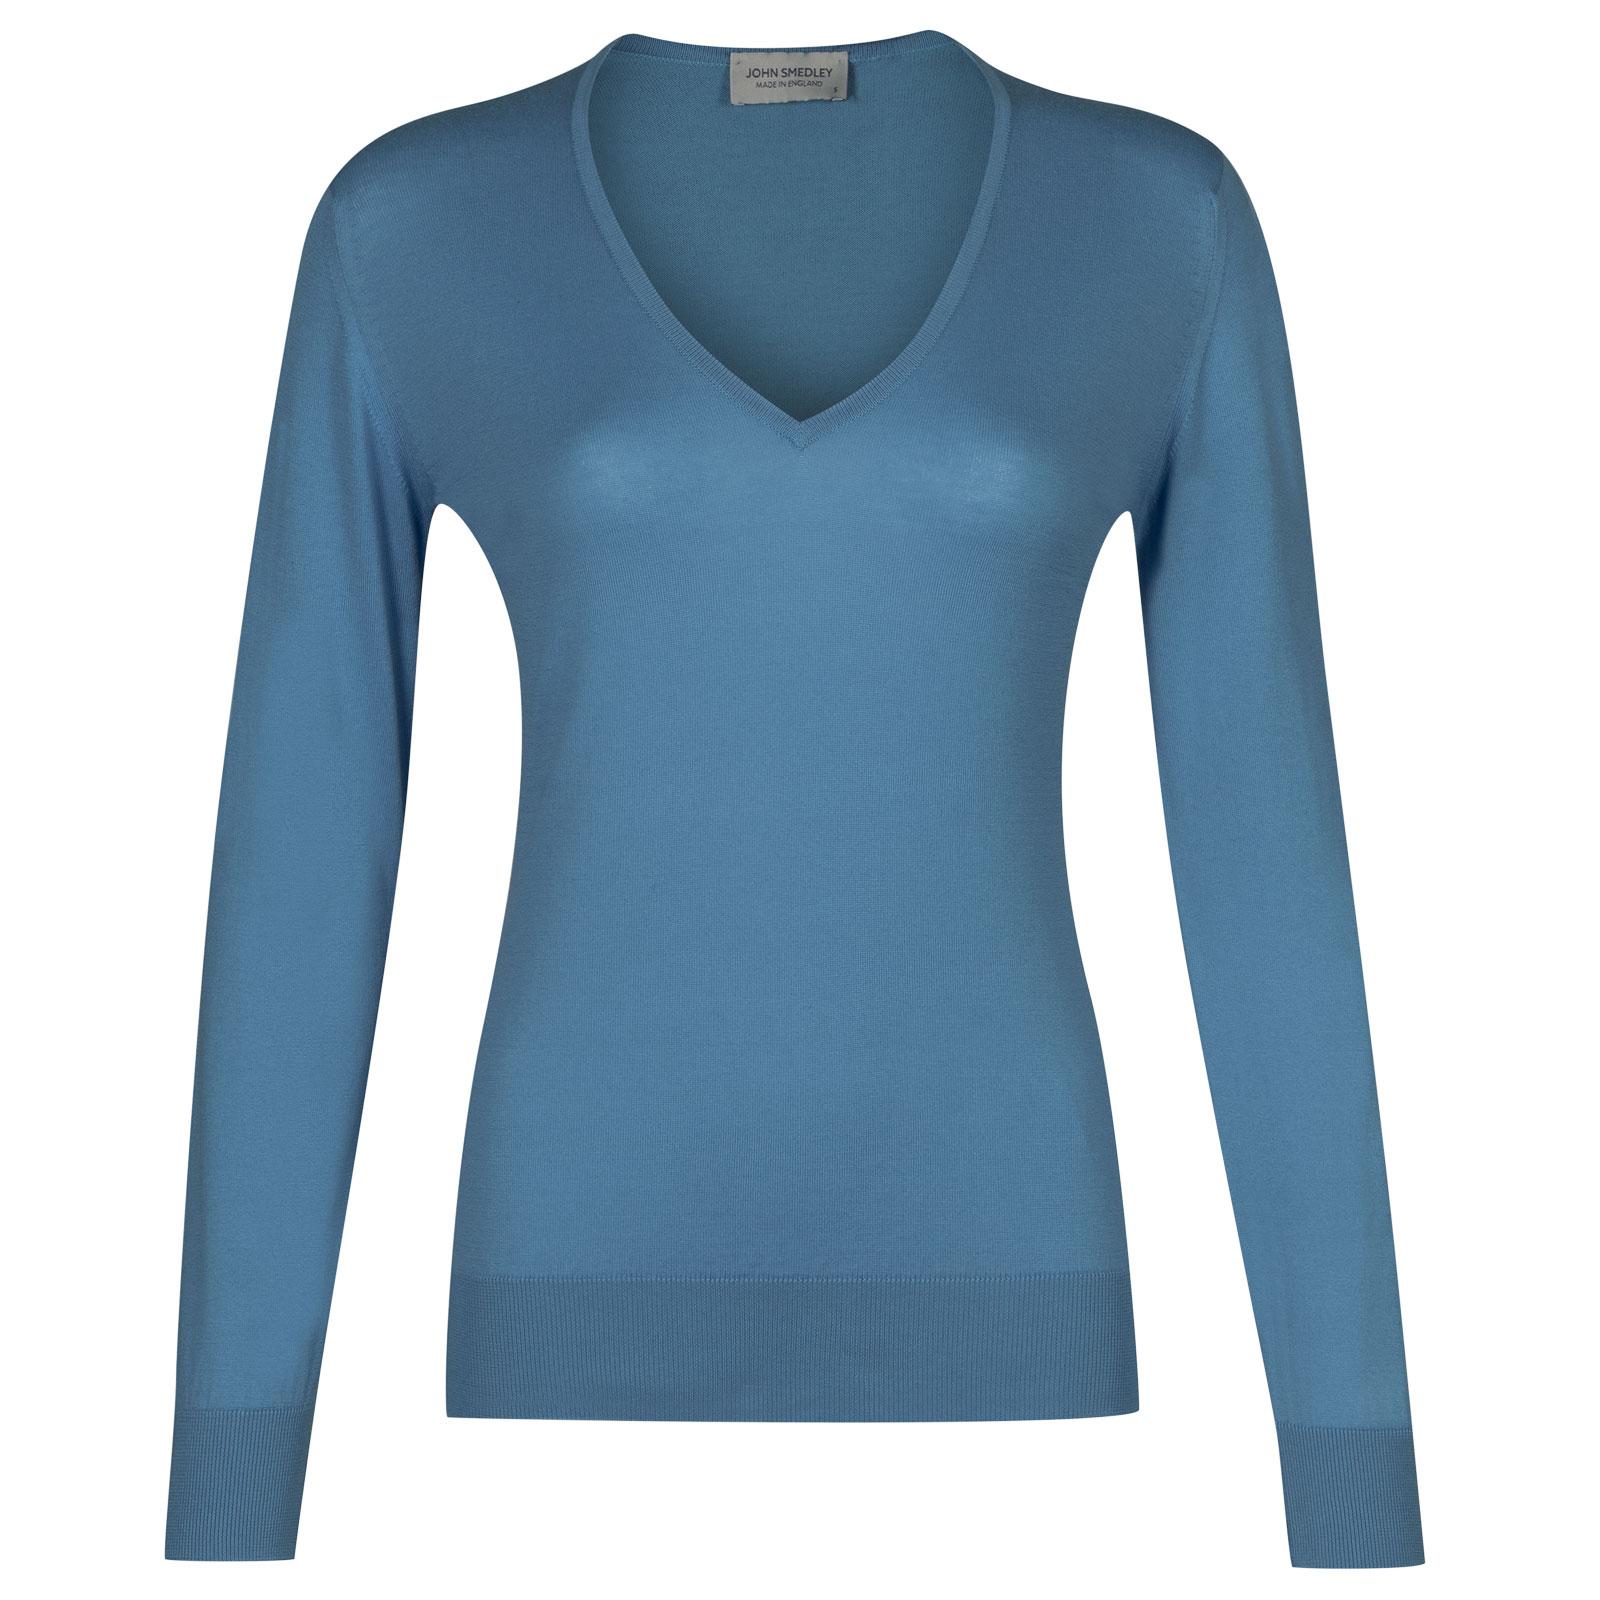 putney-sebastian-blue-L